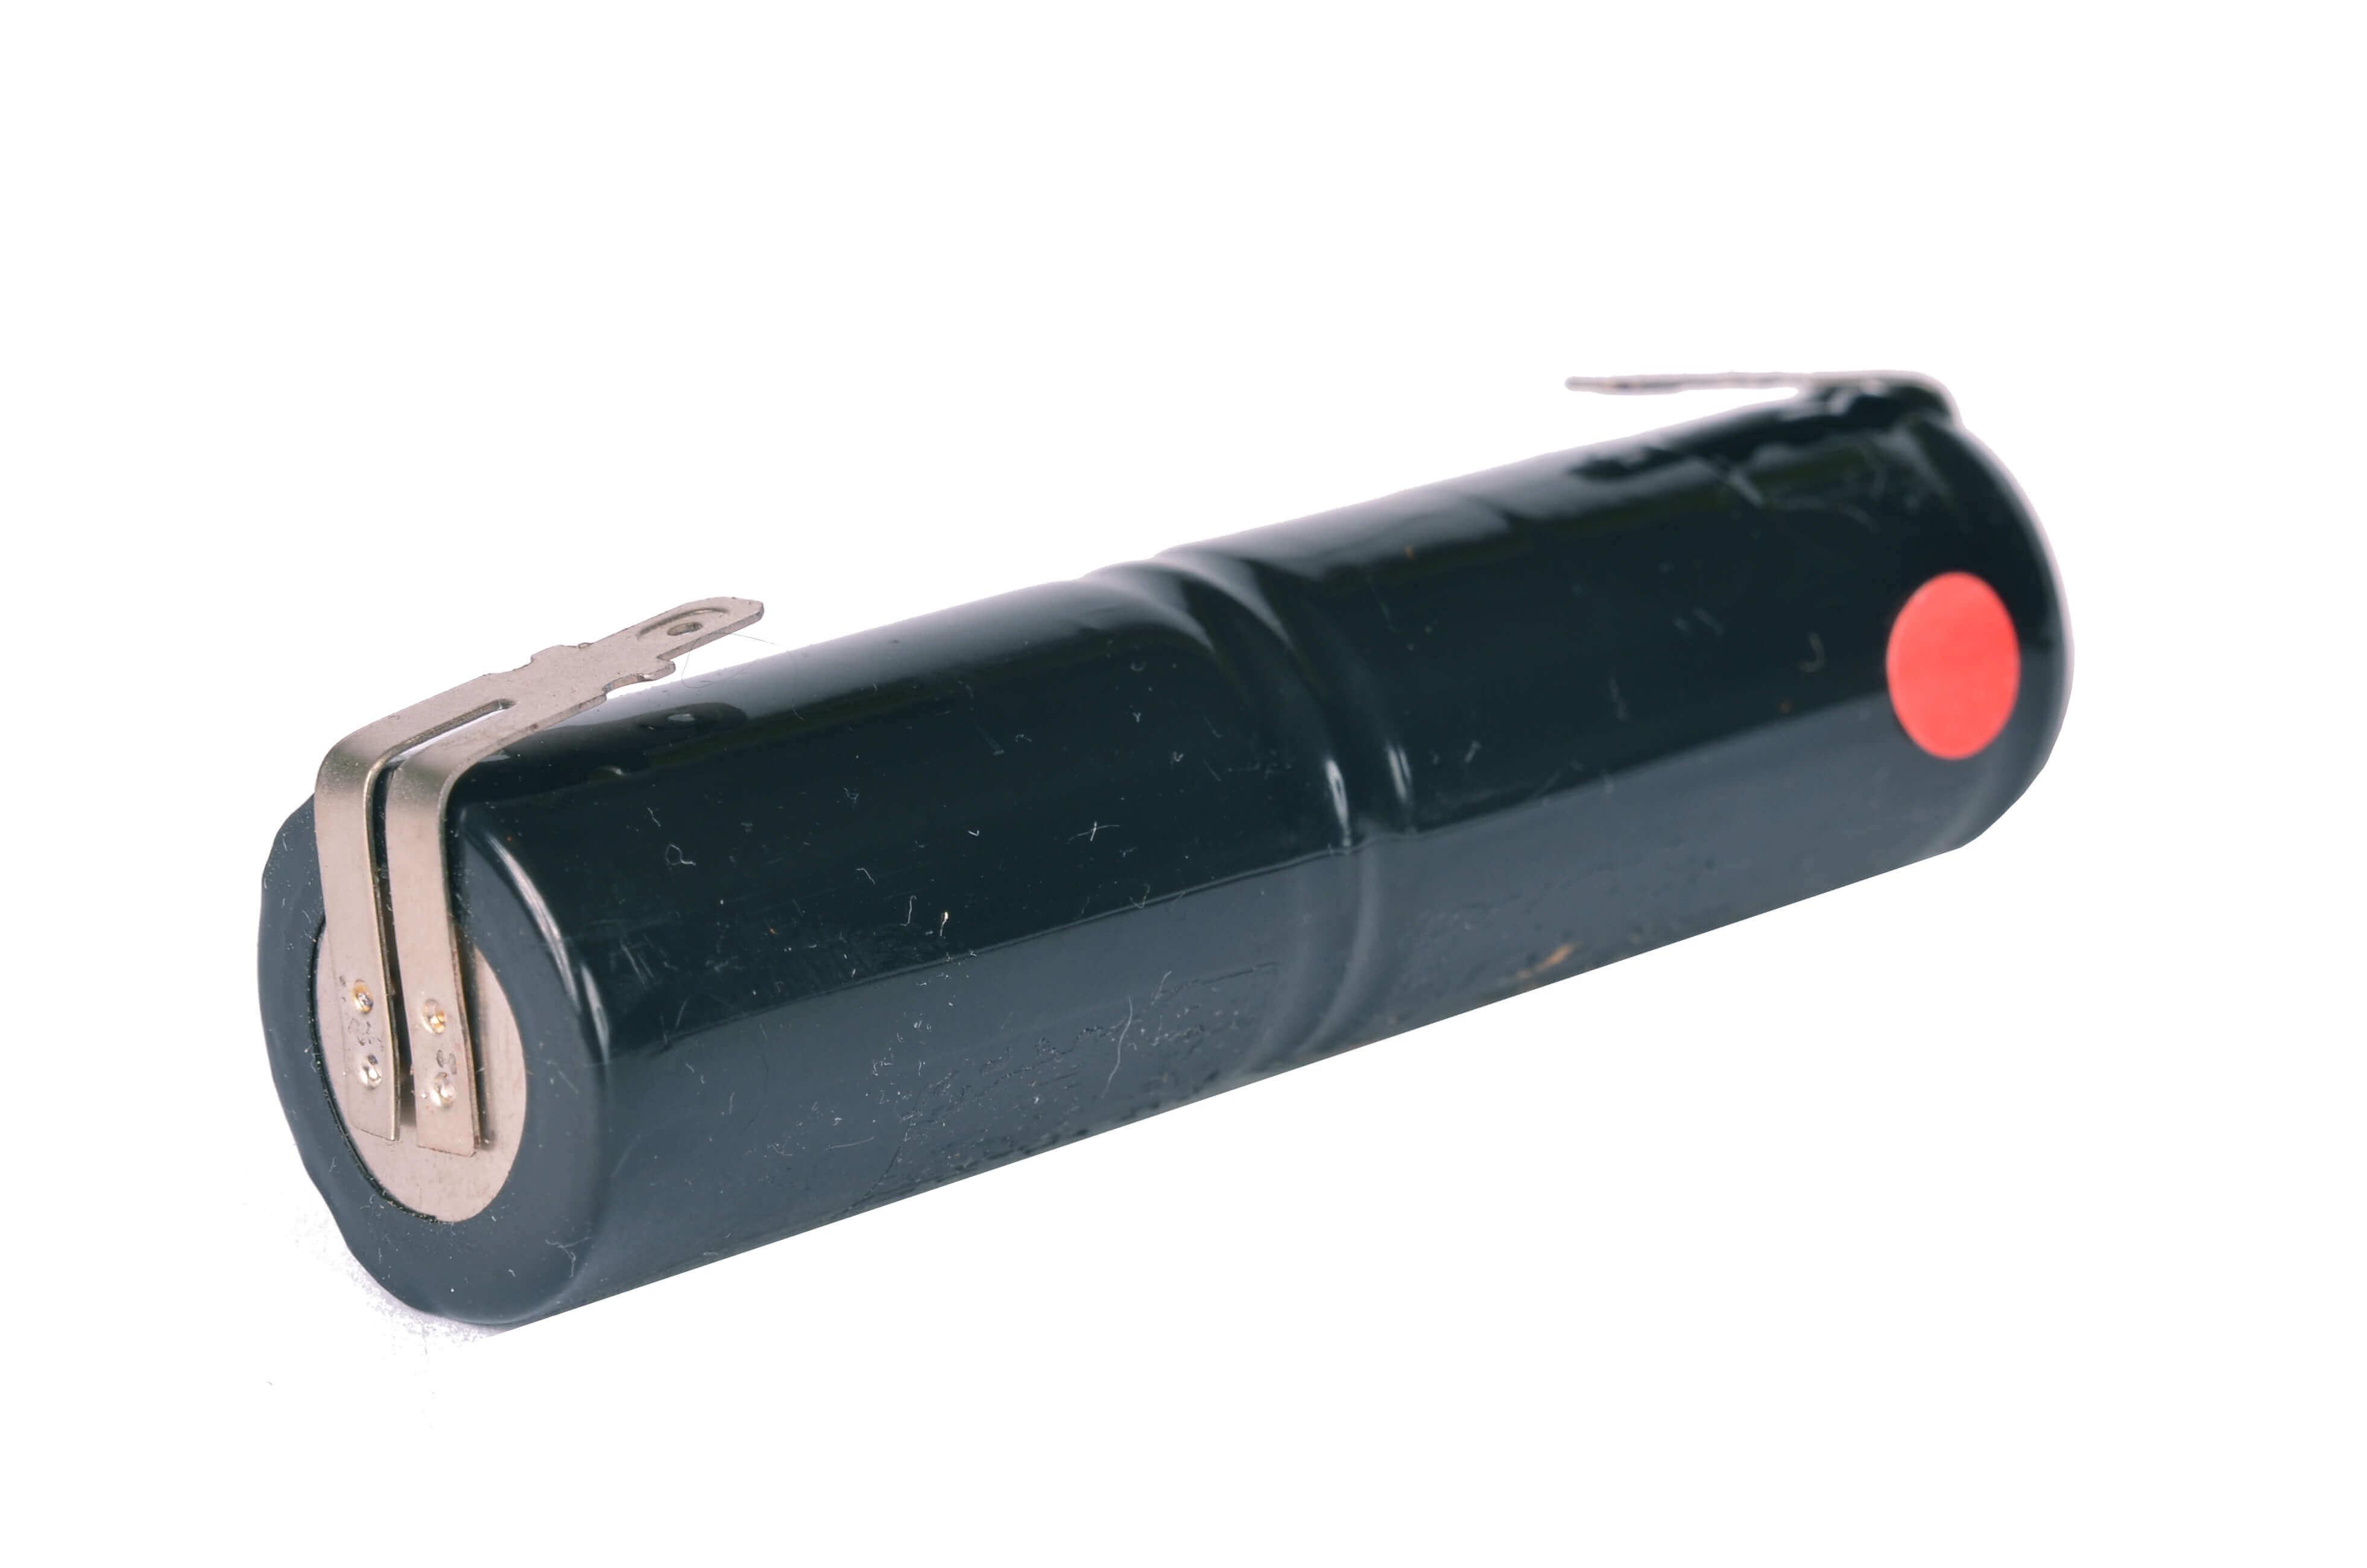 Akkupack Notlicht Notbeleuchtung 2,4V / 1500mAh (1,5Ah) Stabform mit Faston Anschlüssen